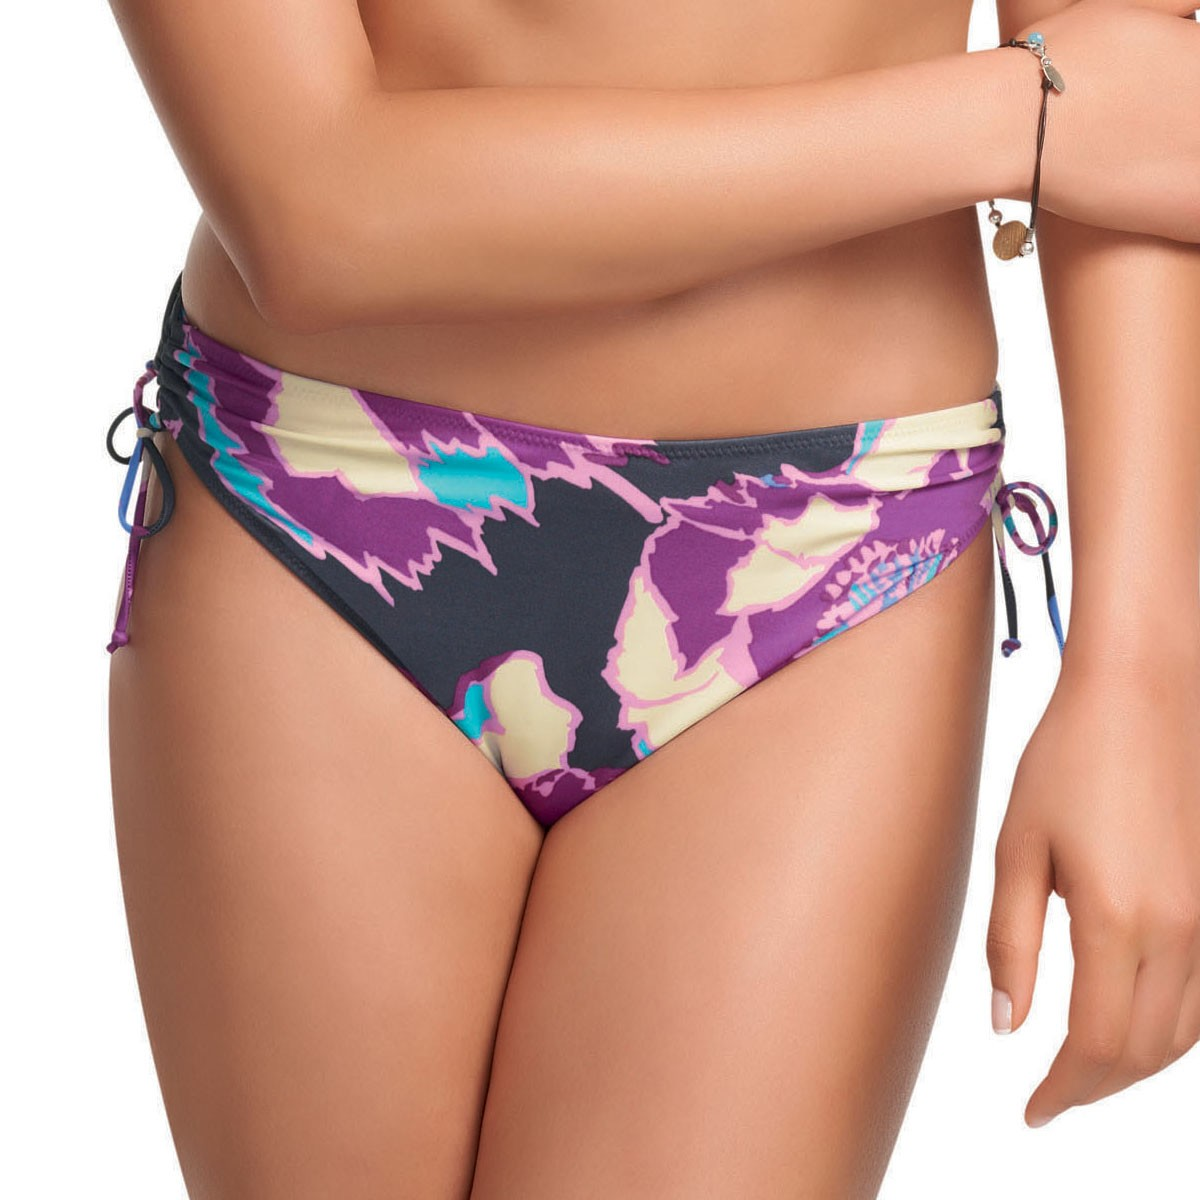 Fantasie Martinique Adjustable Leg Bikini Briefs - Radiant Orchid